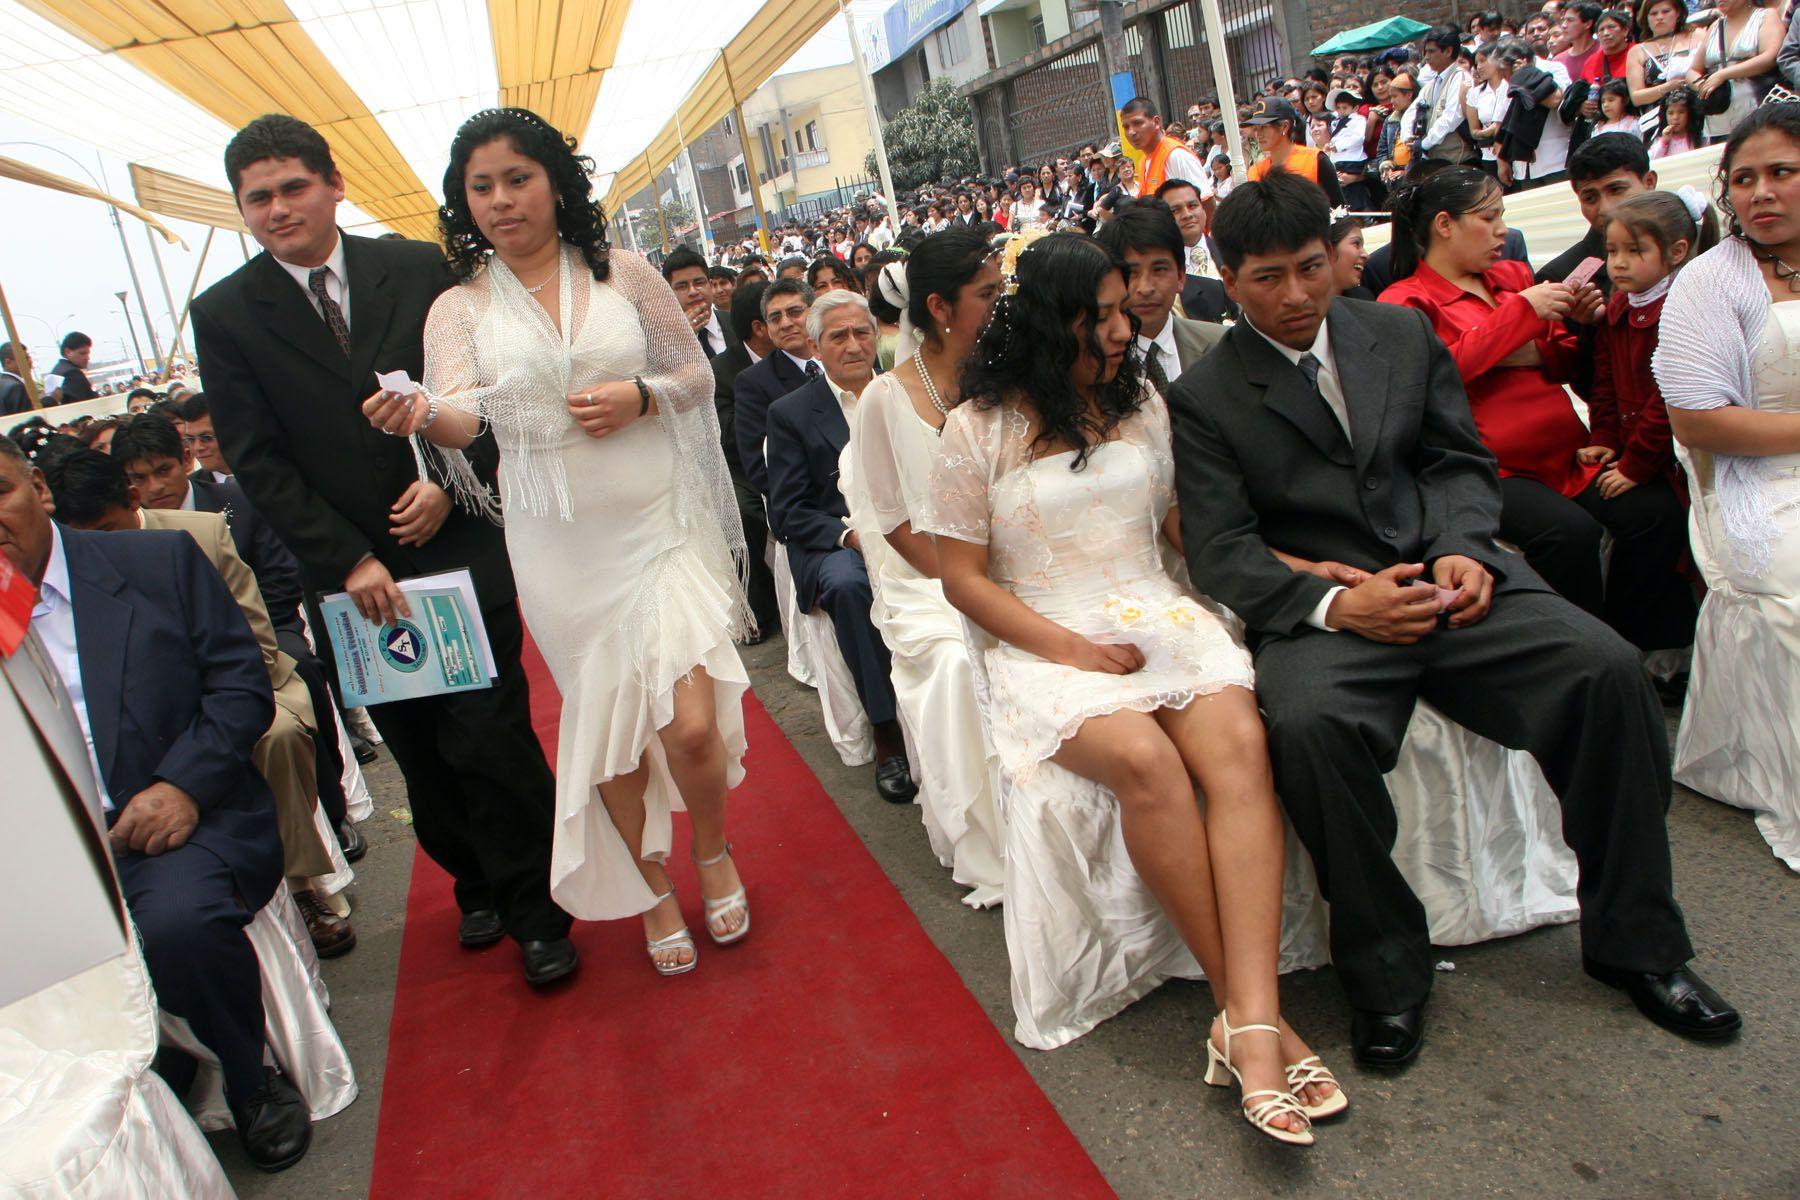 Matrimonios masivos costarán 80 soles en San Luis. Foto: ANDINA/Archivo.